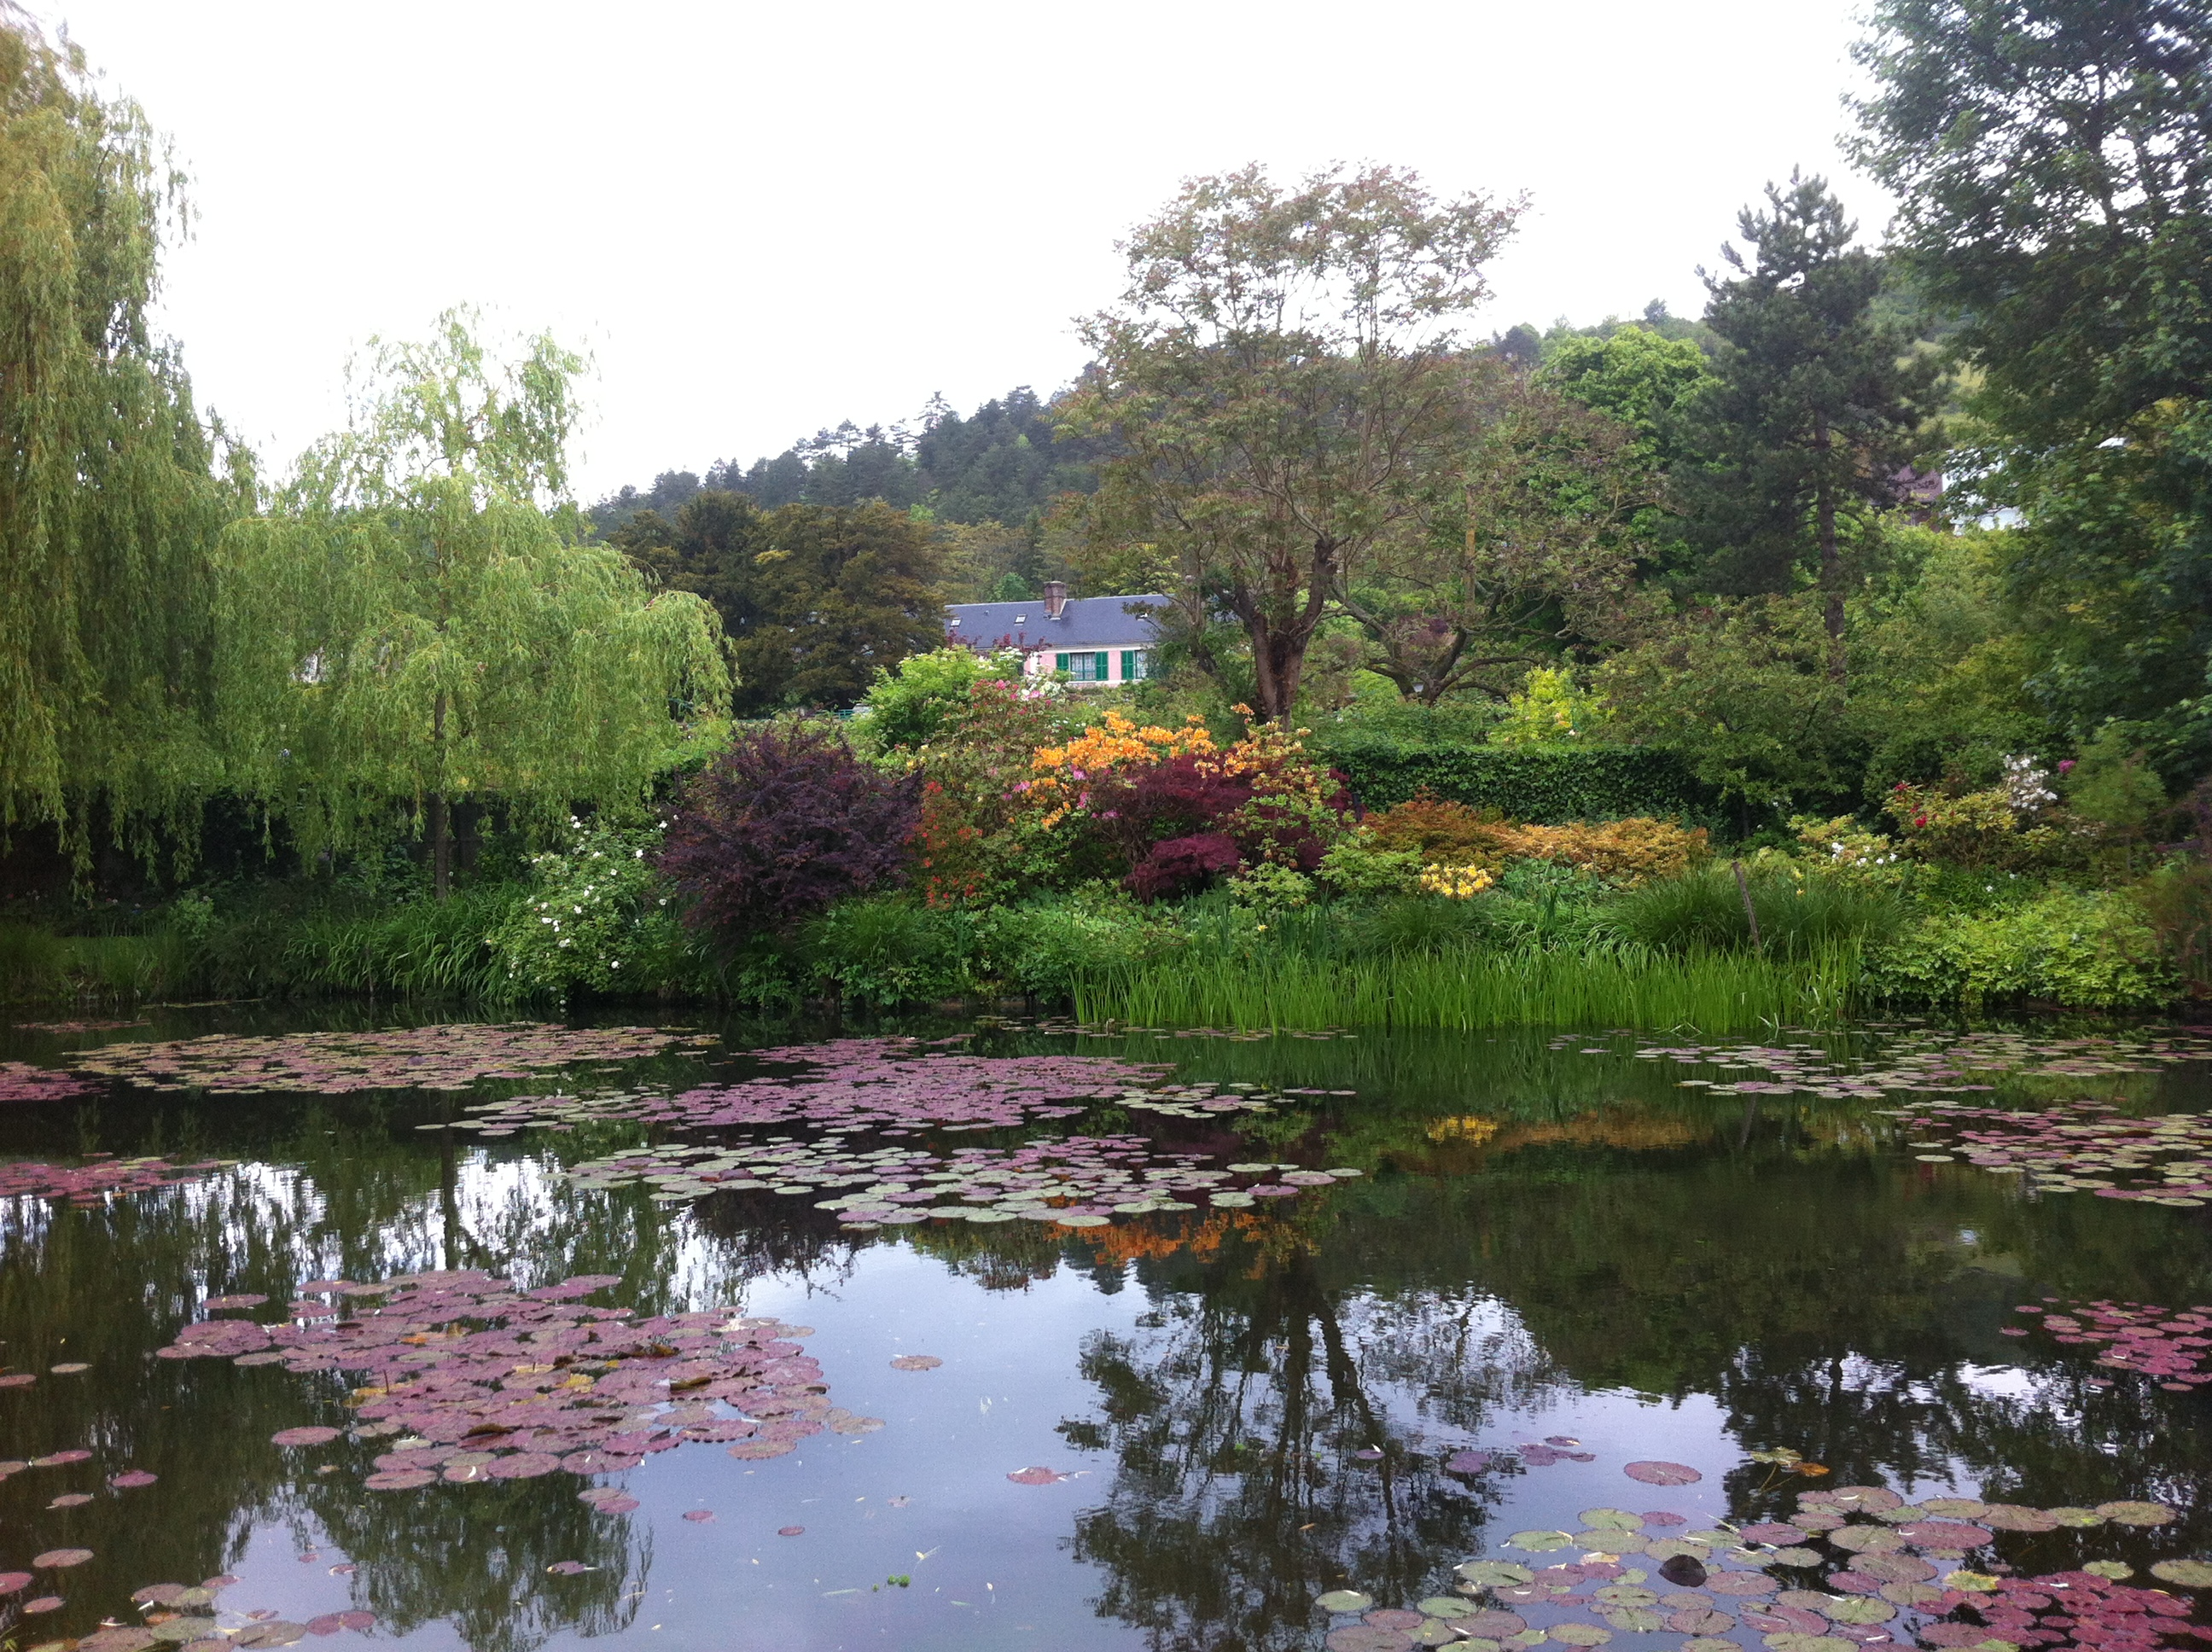 A visit to Monet's garden